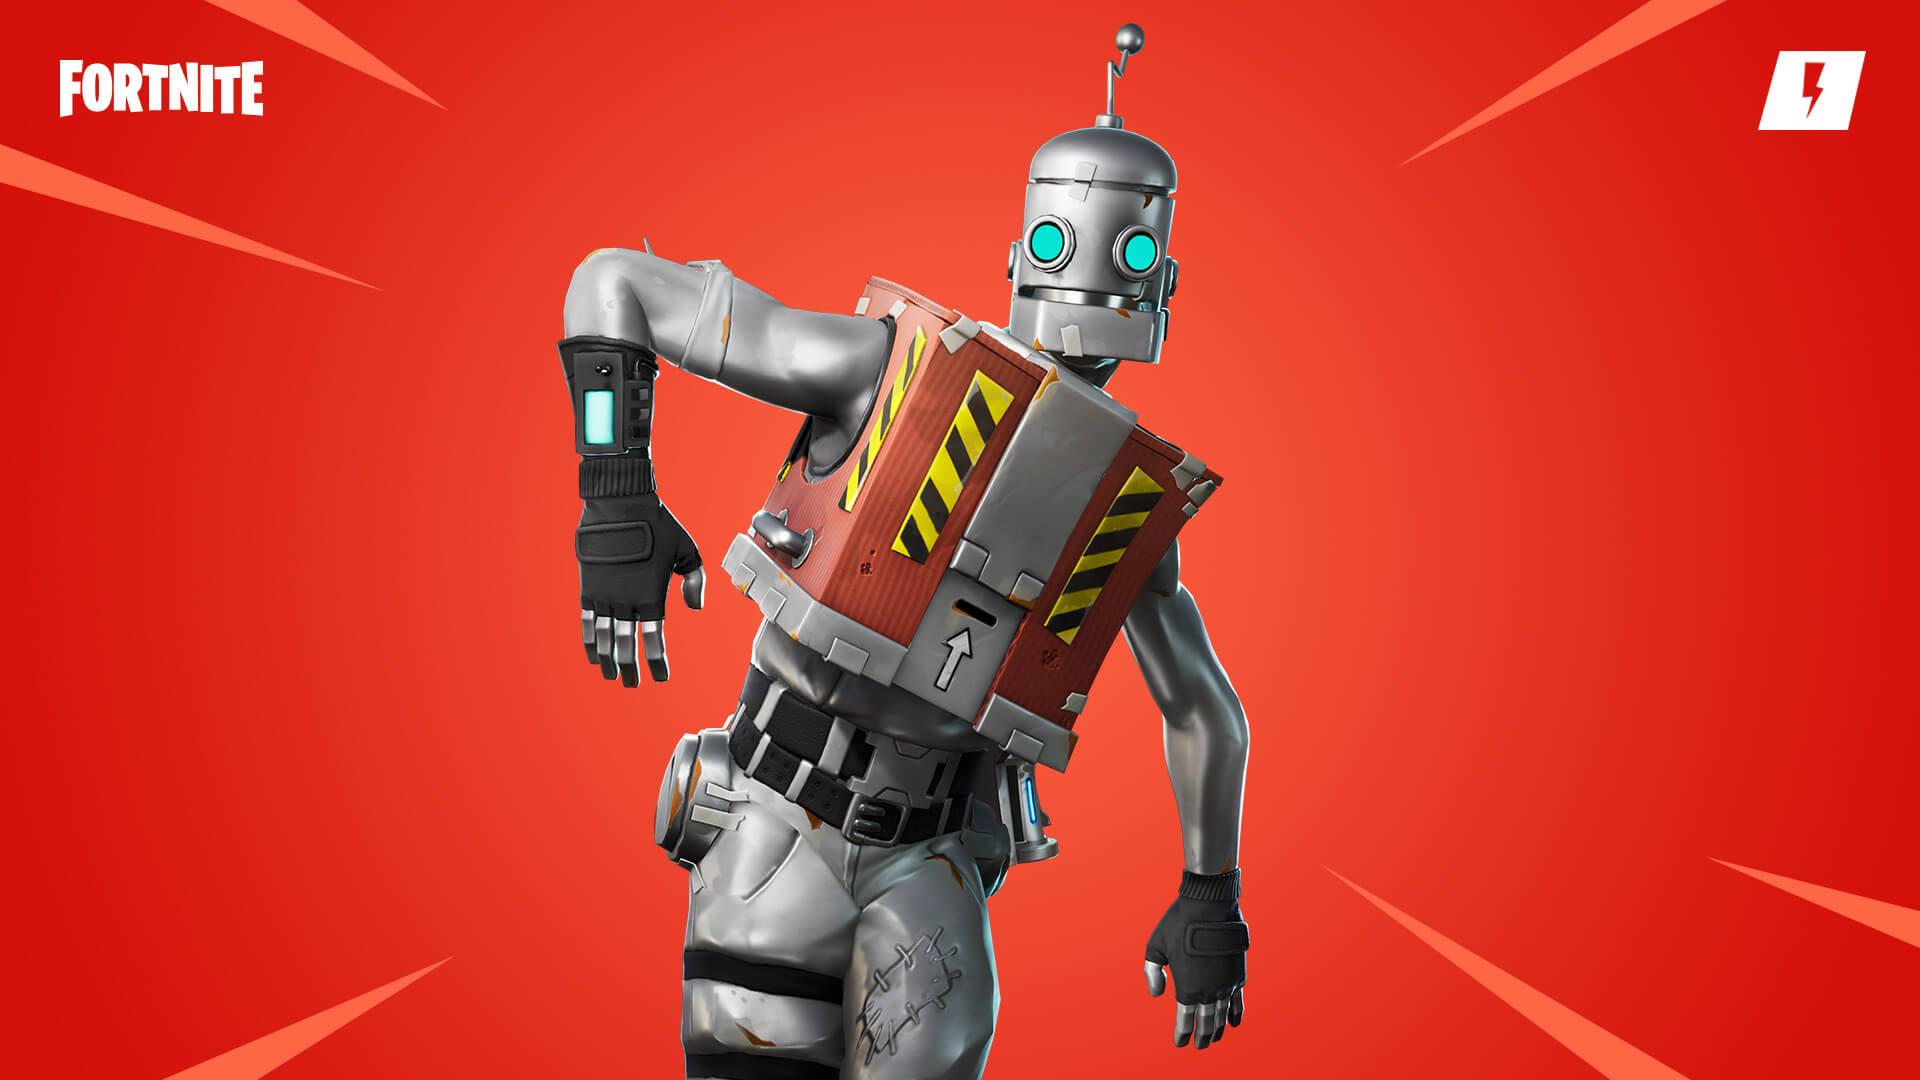 Fortnite Save The World Jonesee Bot